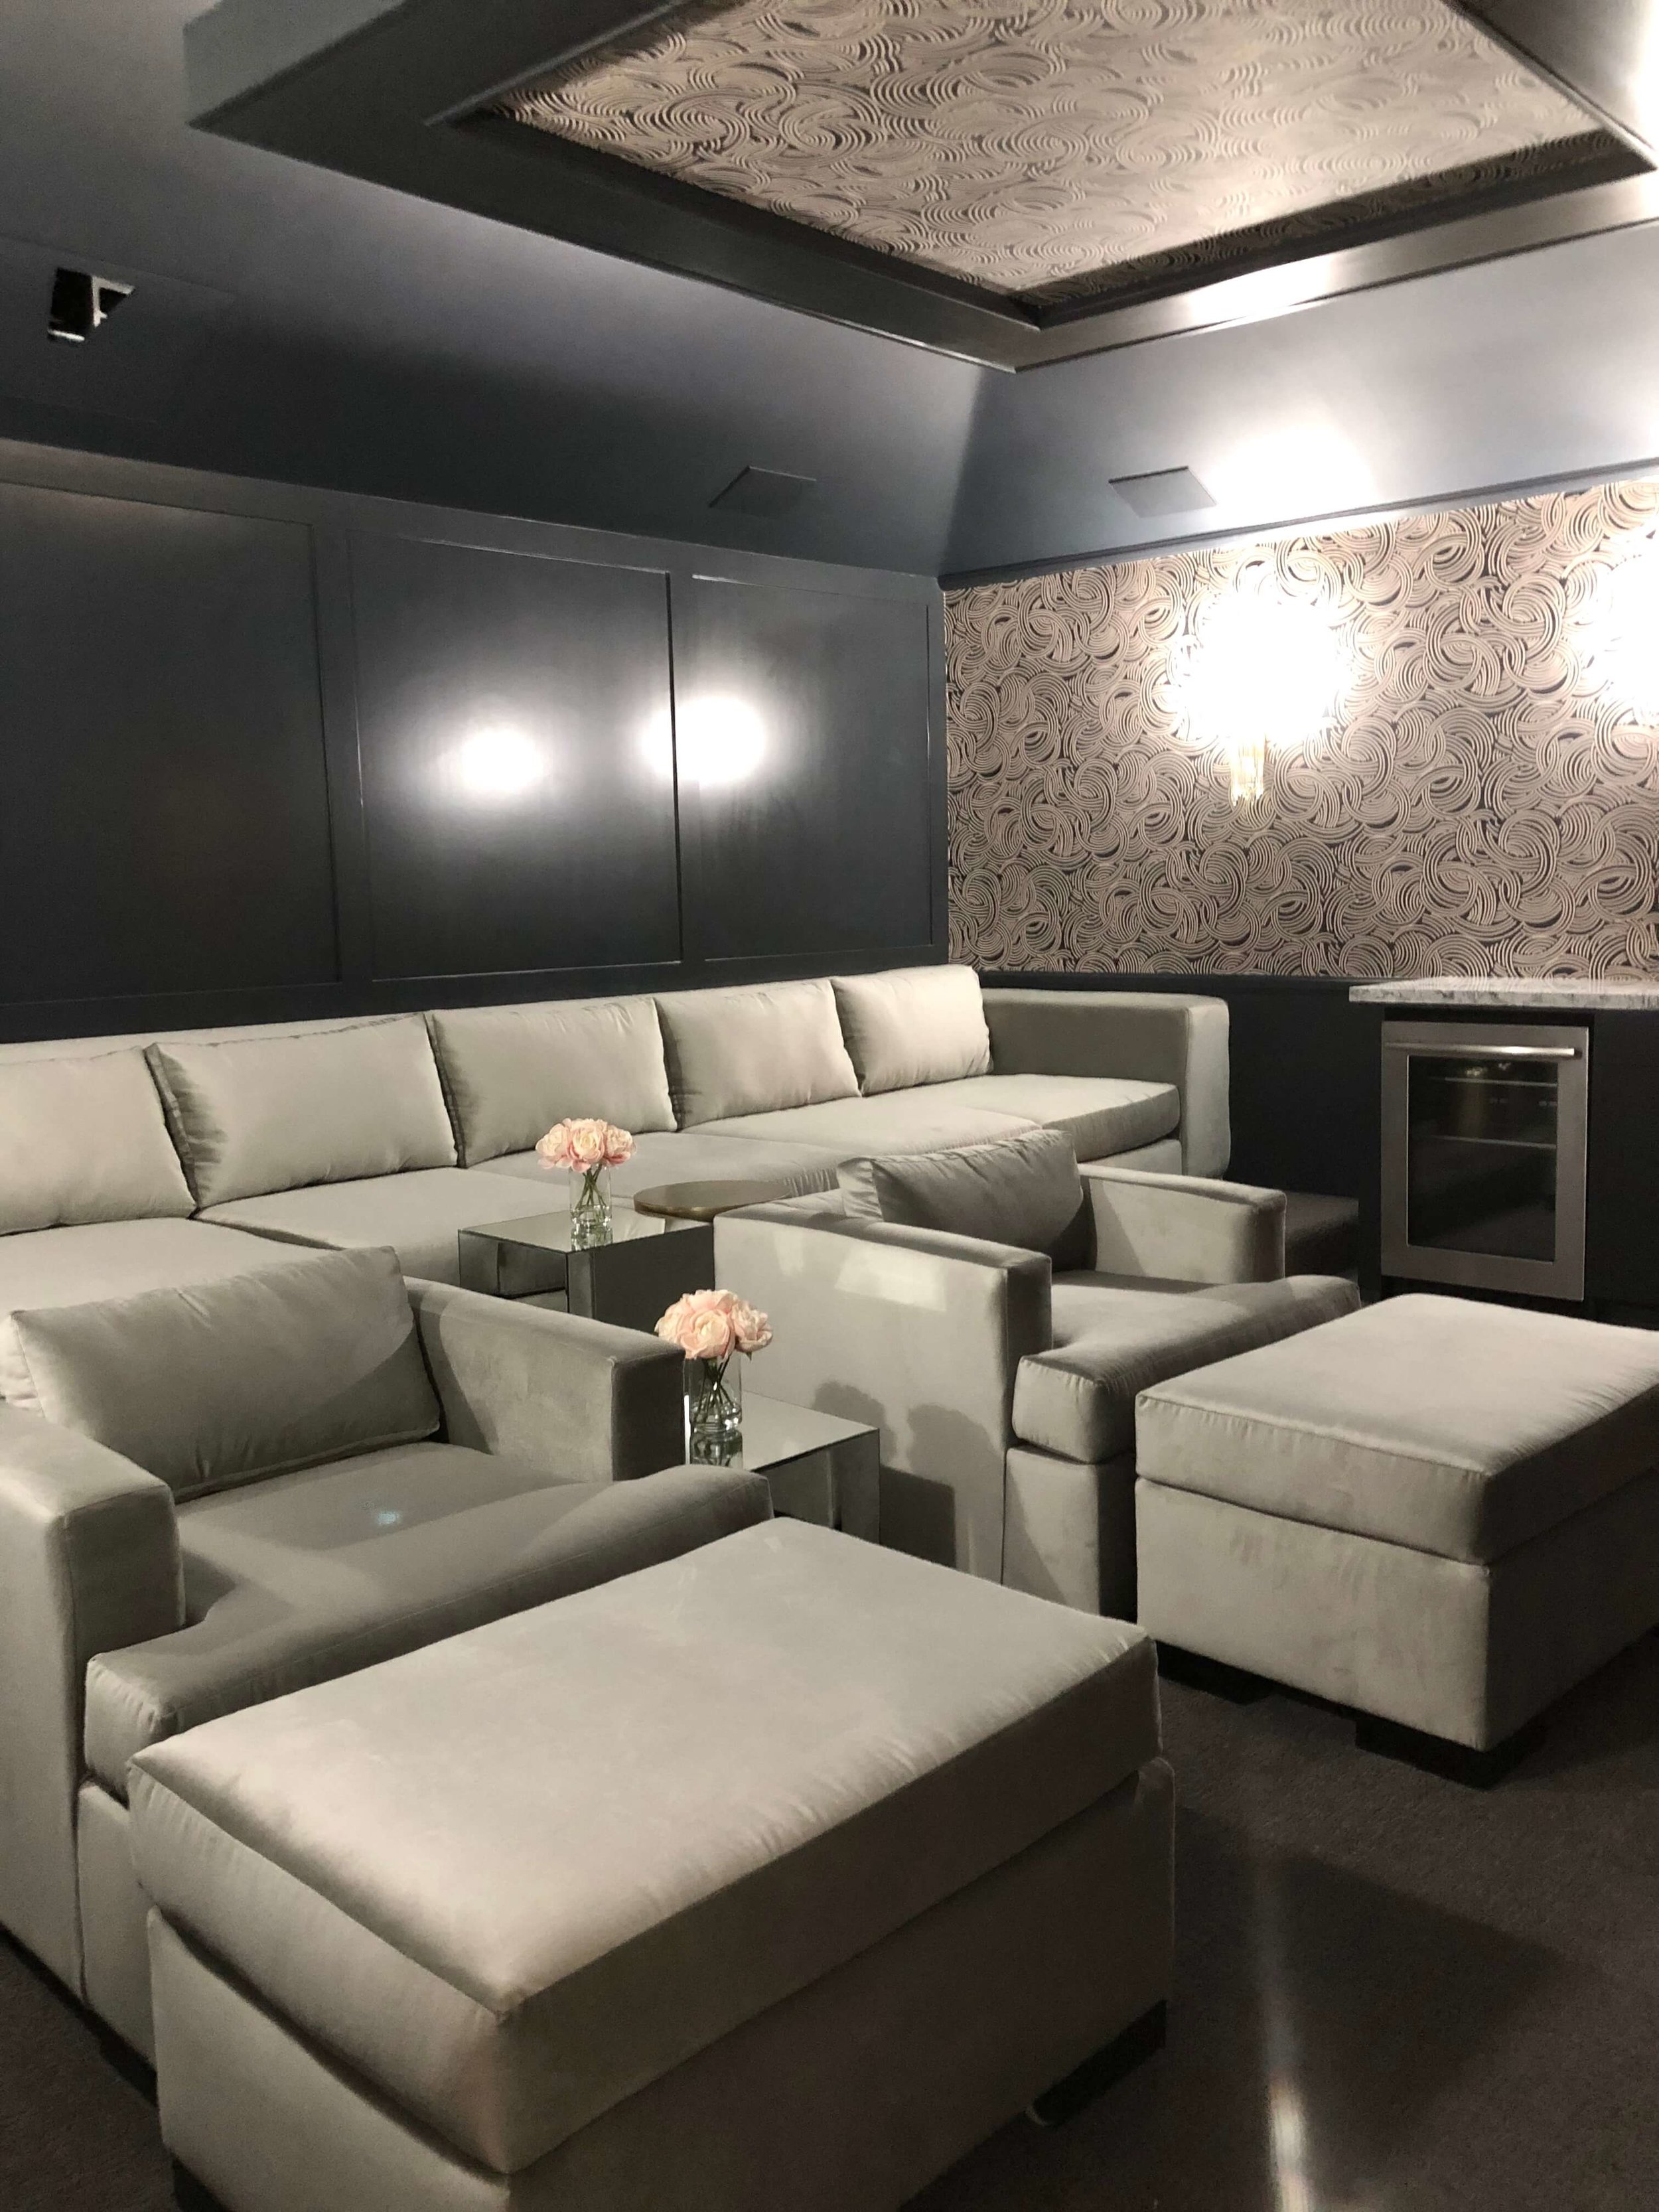 Media Room designed by Janet Sanchez, JS Design+Create, Pasadena Showcase House